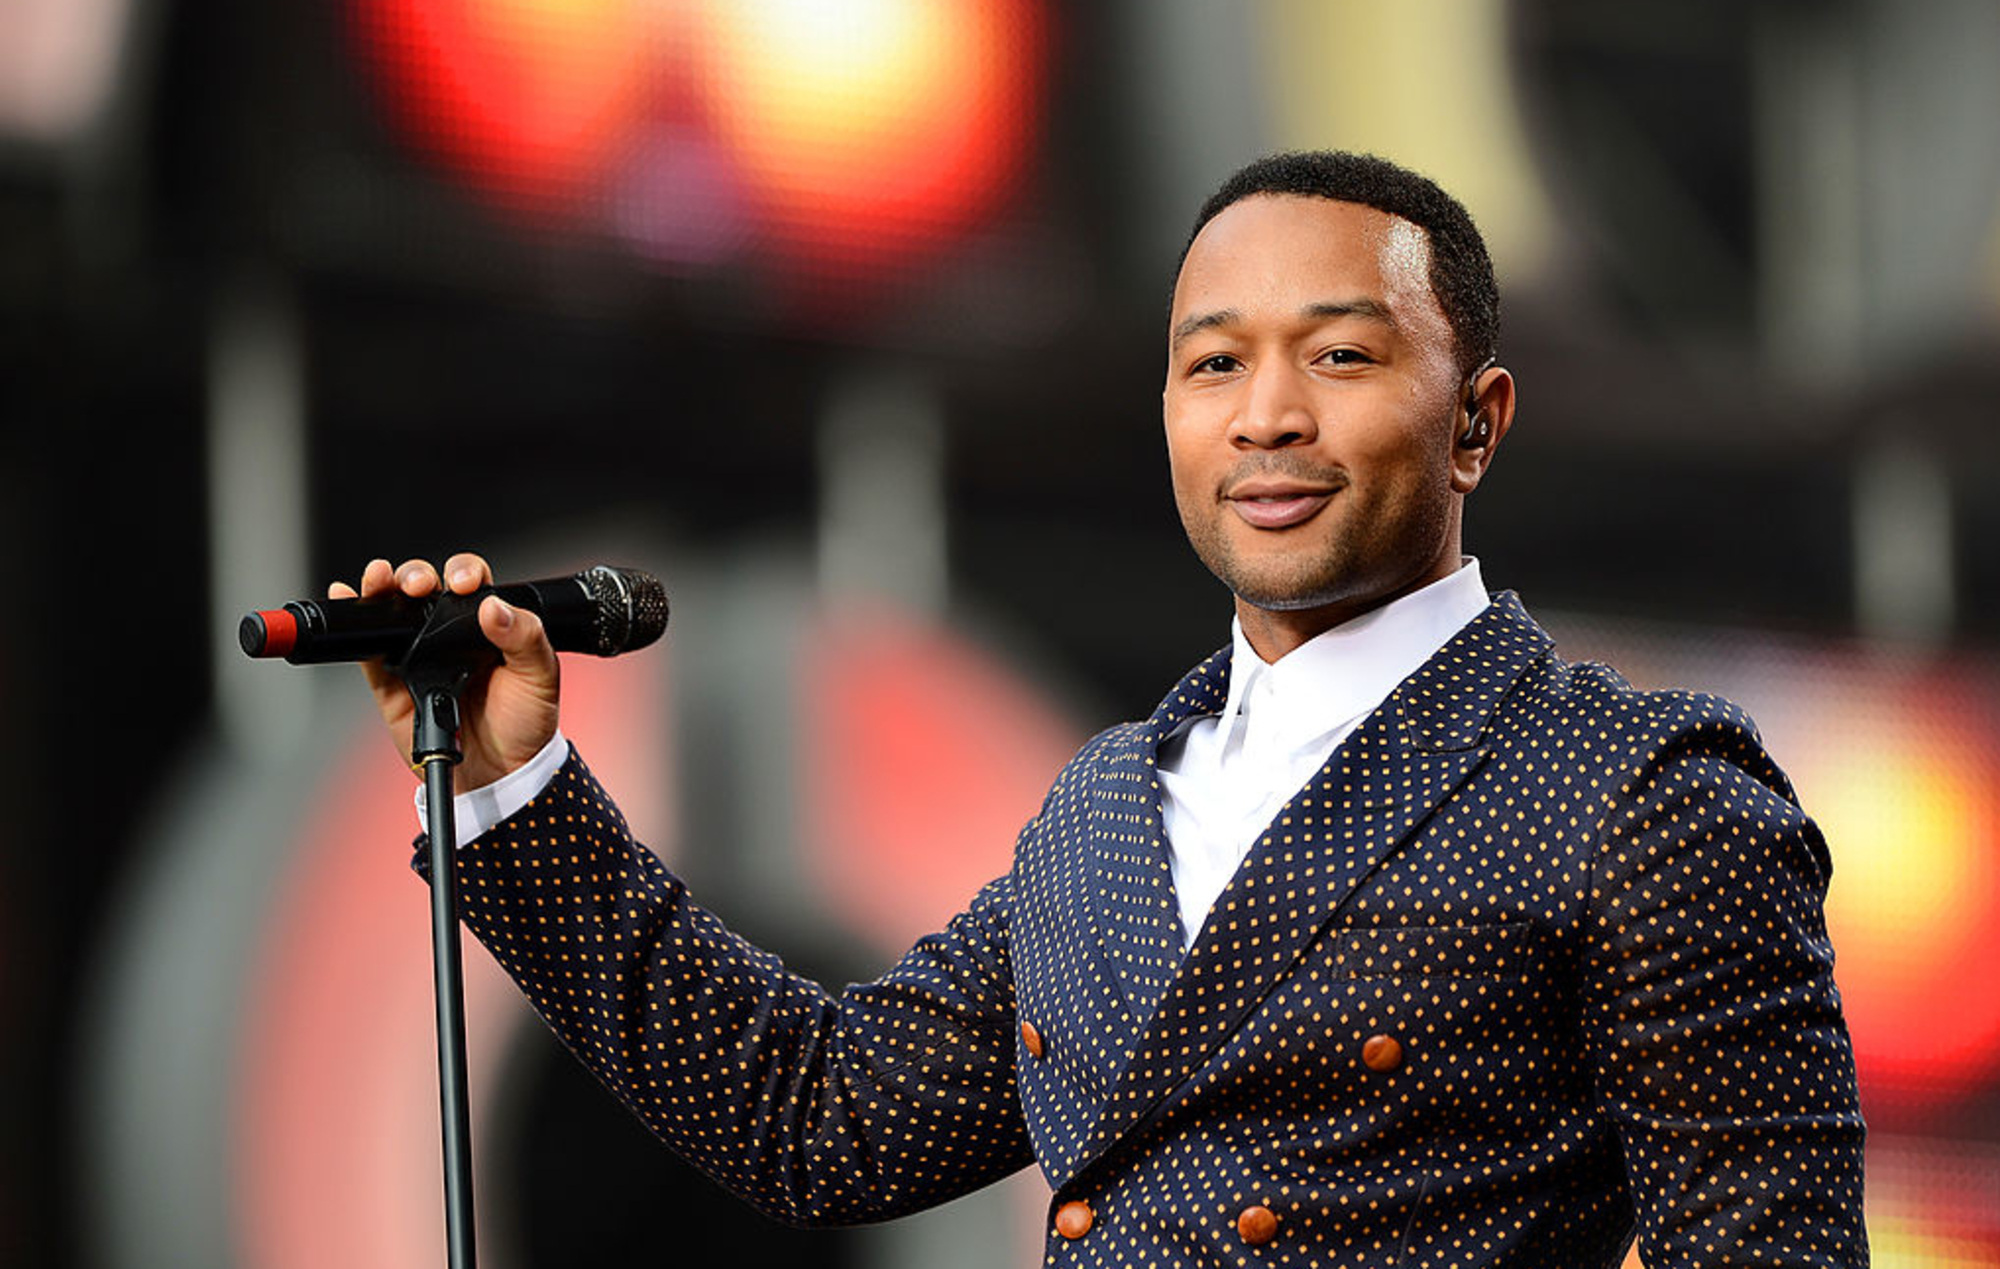 John Legend celebrates 15th anniversary of debut album on same day as his 41st birthday - EpicNews